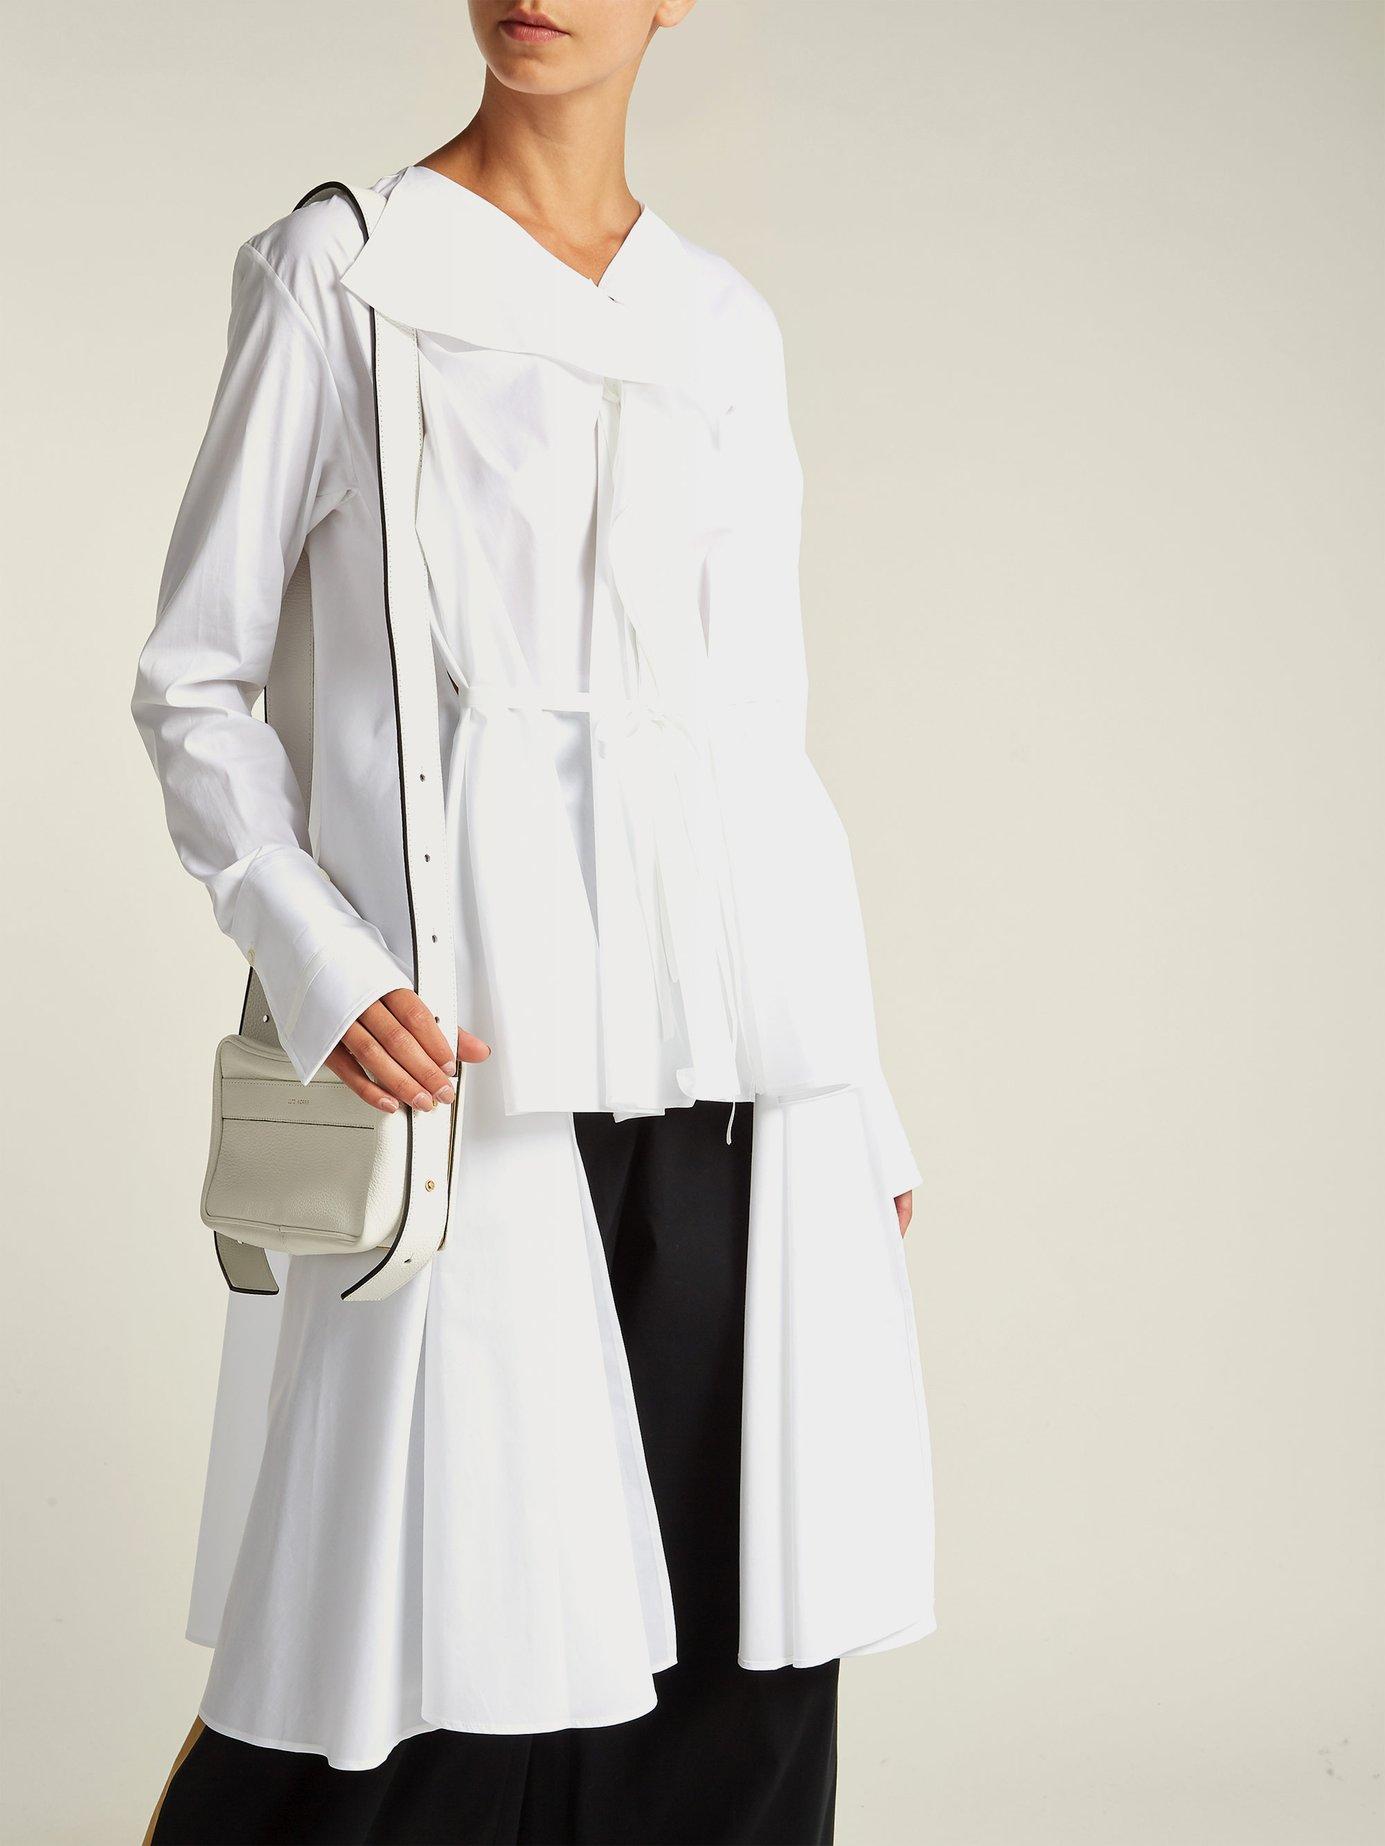 Ruffled V-neck cotton shirt by Palmer/Harding